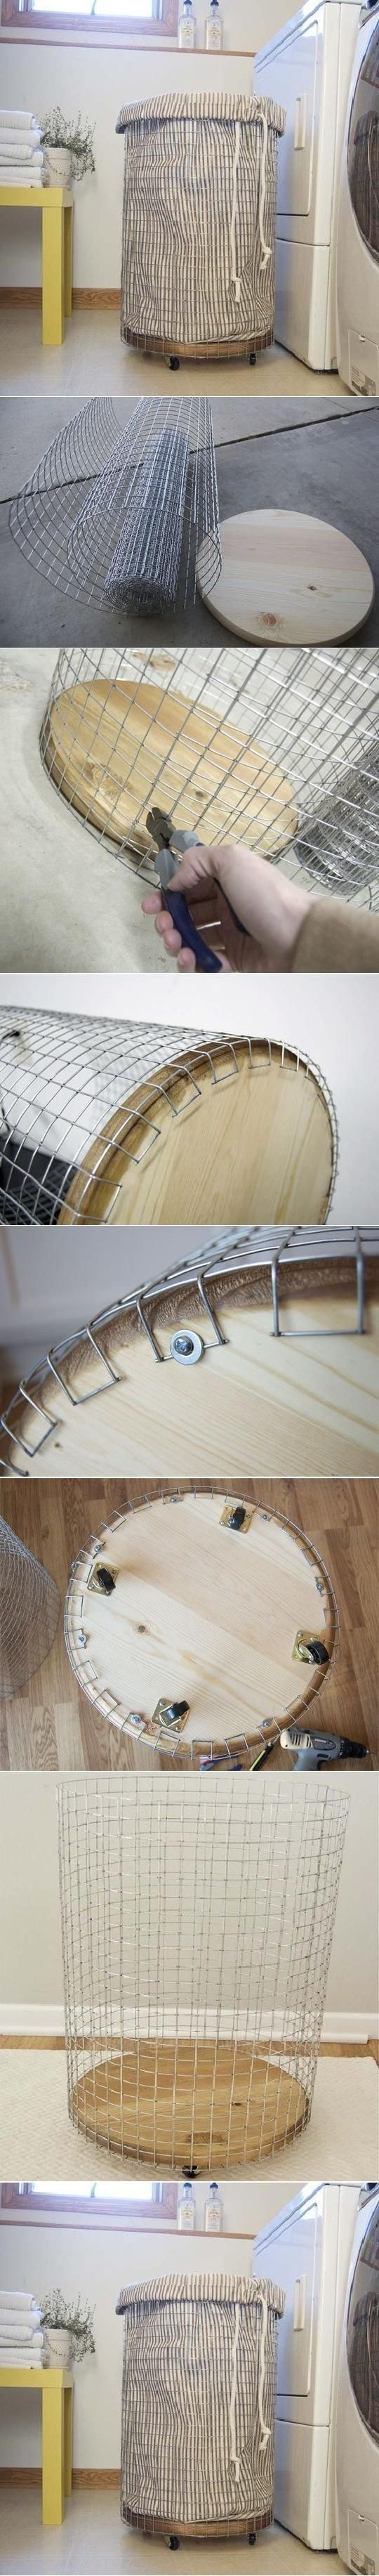 DIY Easy Laundry Basket, maybe spray paint white before addling castors...